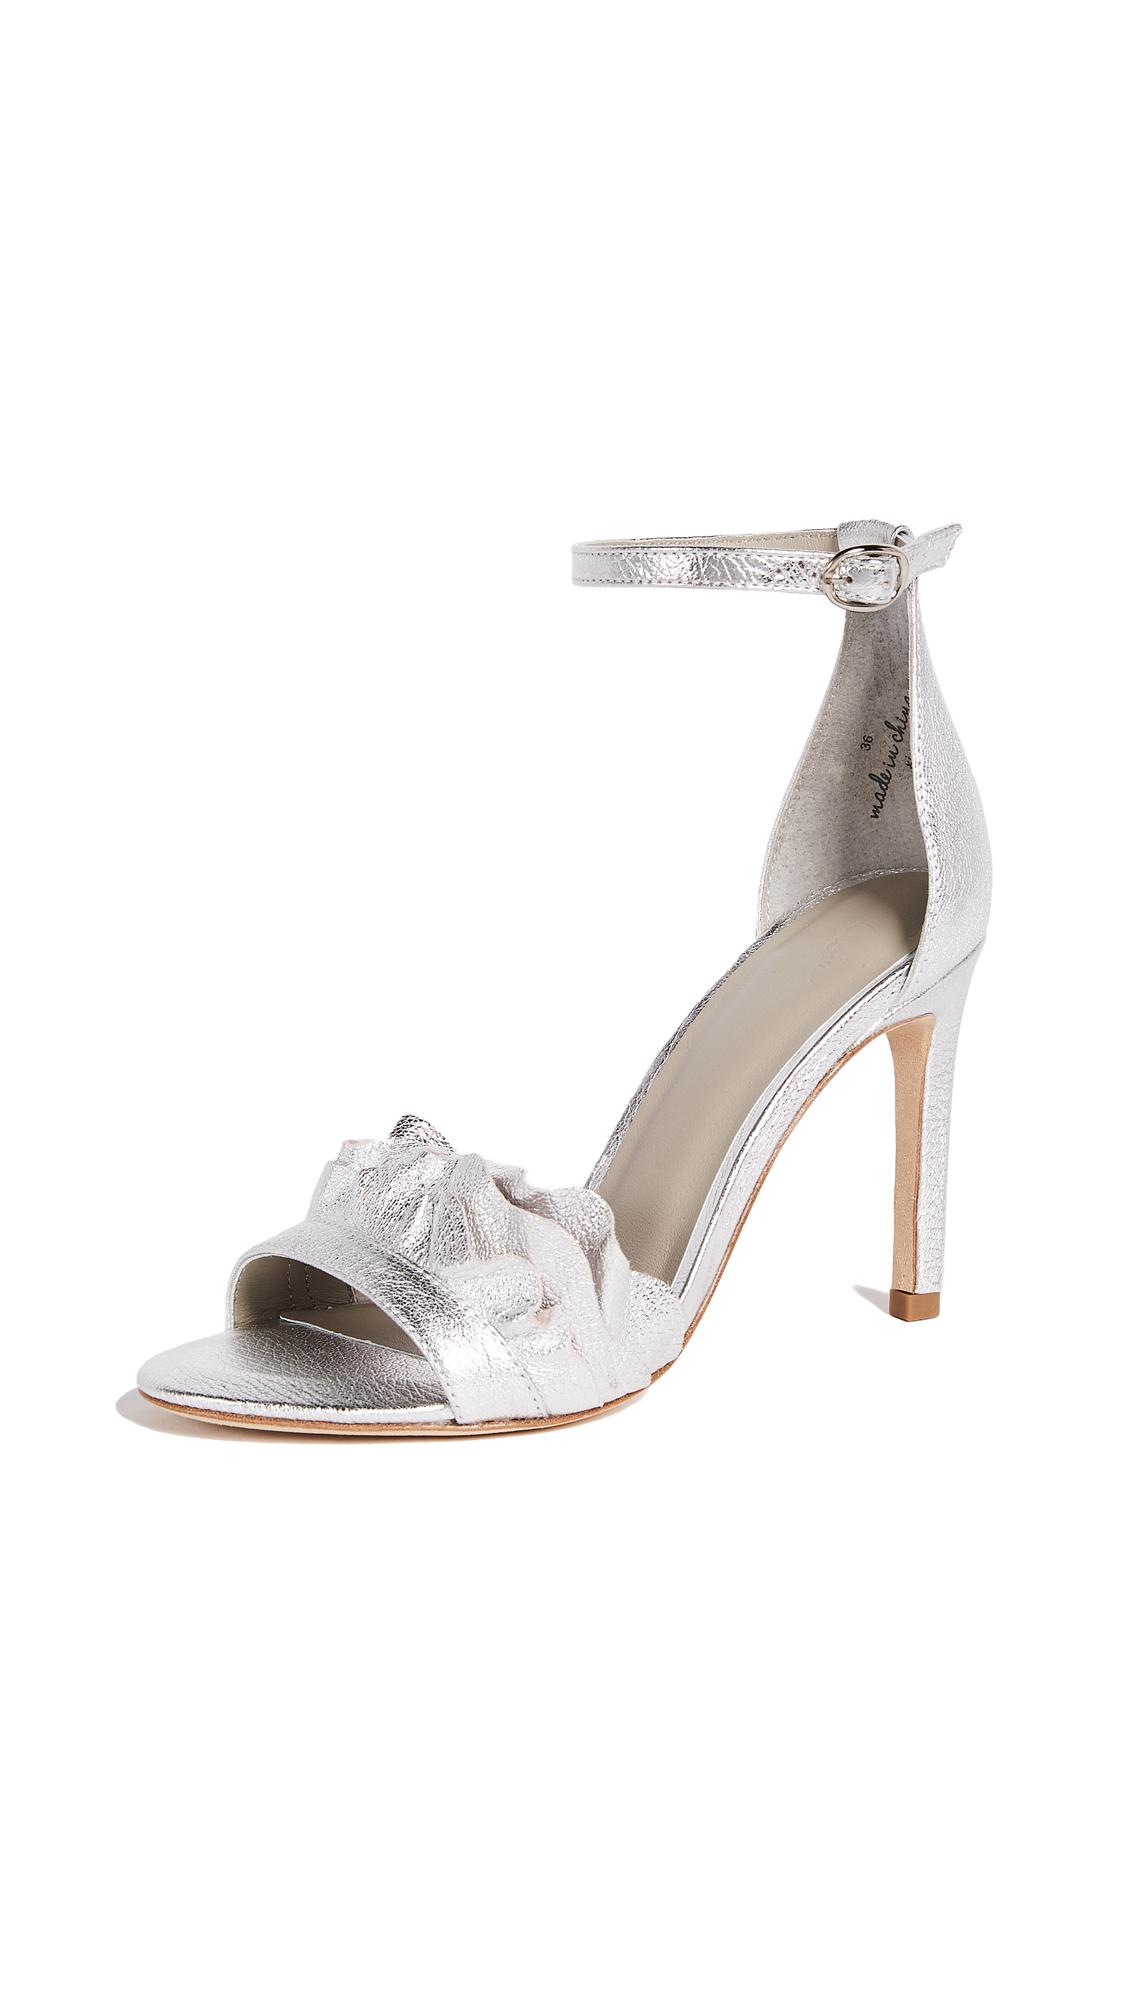 Joie Abigail Sandals - Silver Metallic